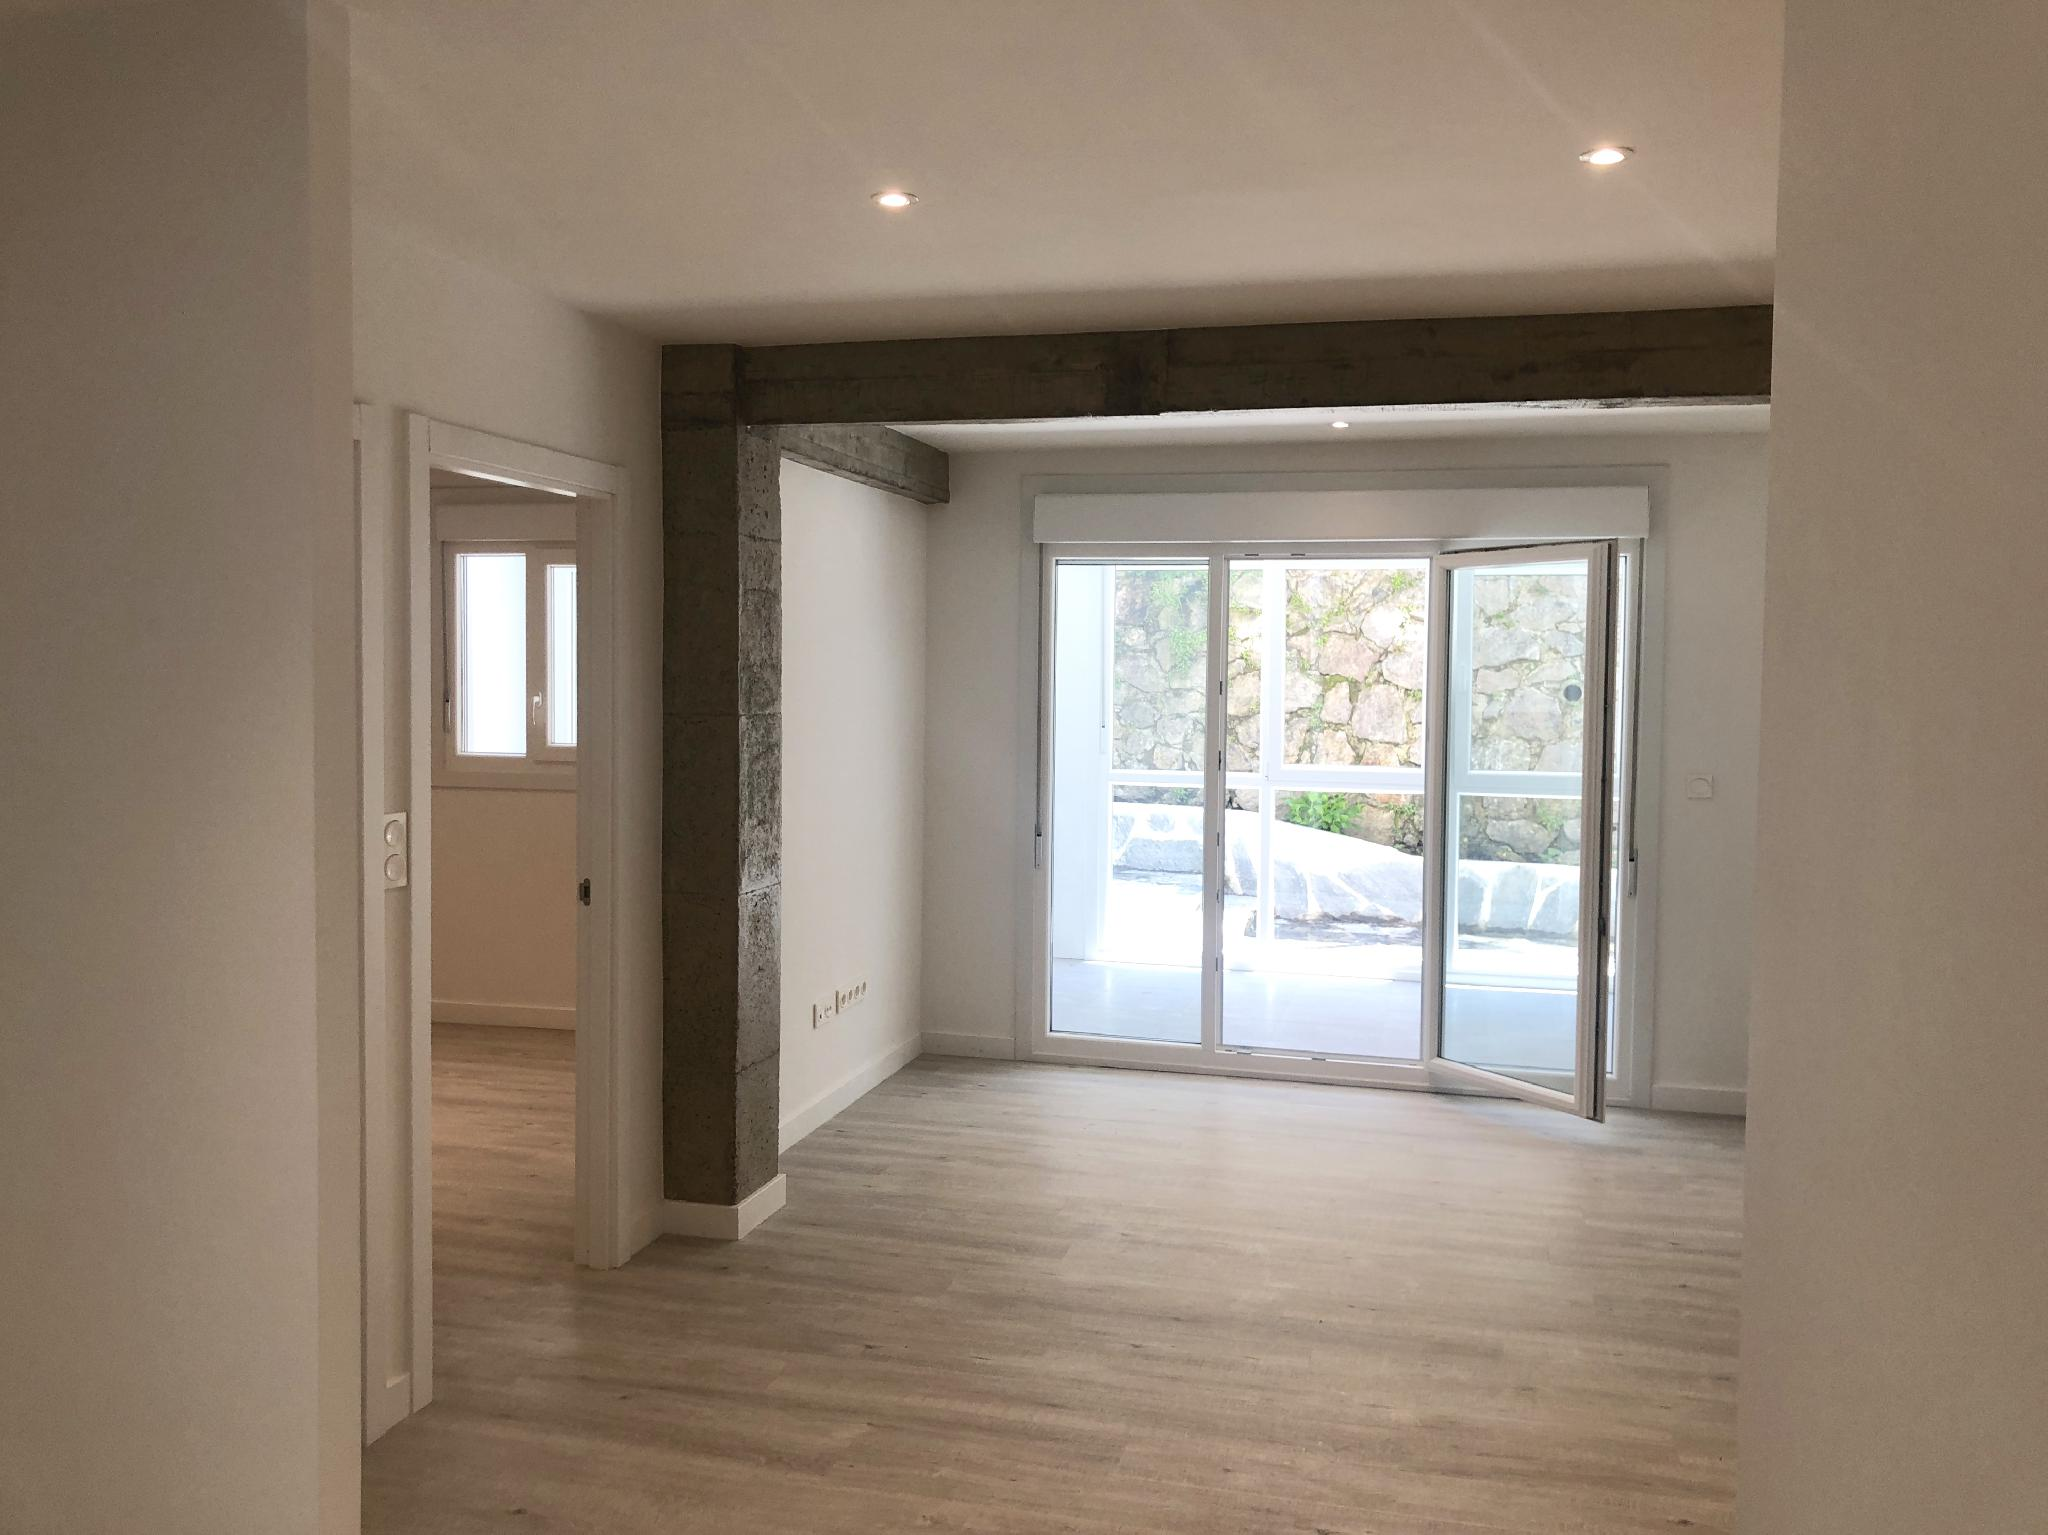 Pisos en alquiler en hernani baratos perfect bonito piso con terraza a orientacin sur en amara - Pisos en alquiler economicos ...